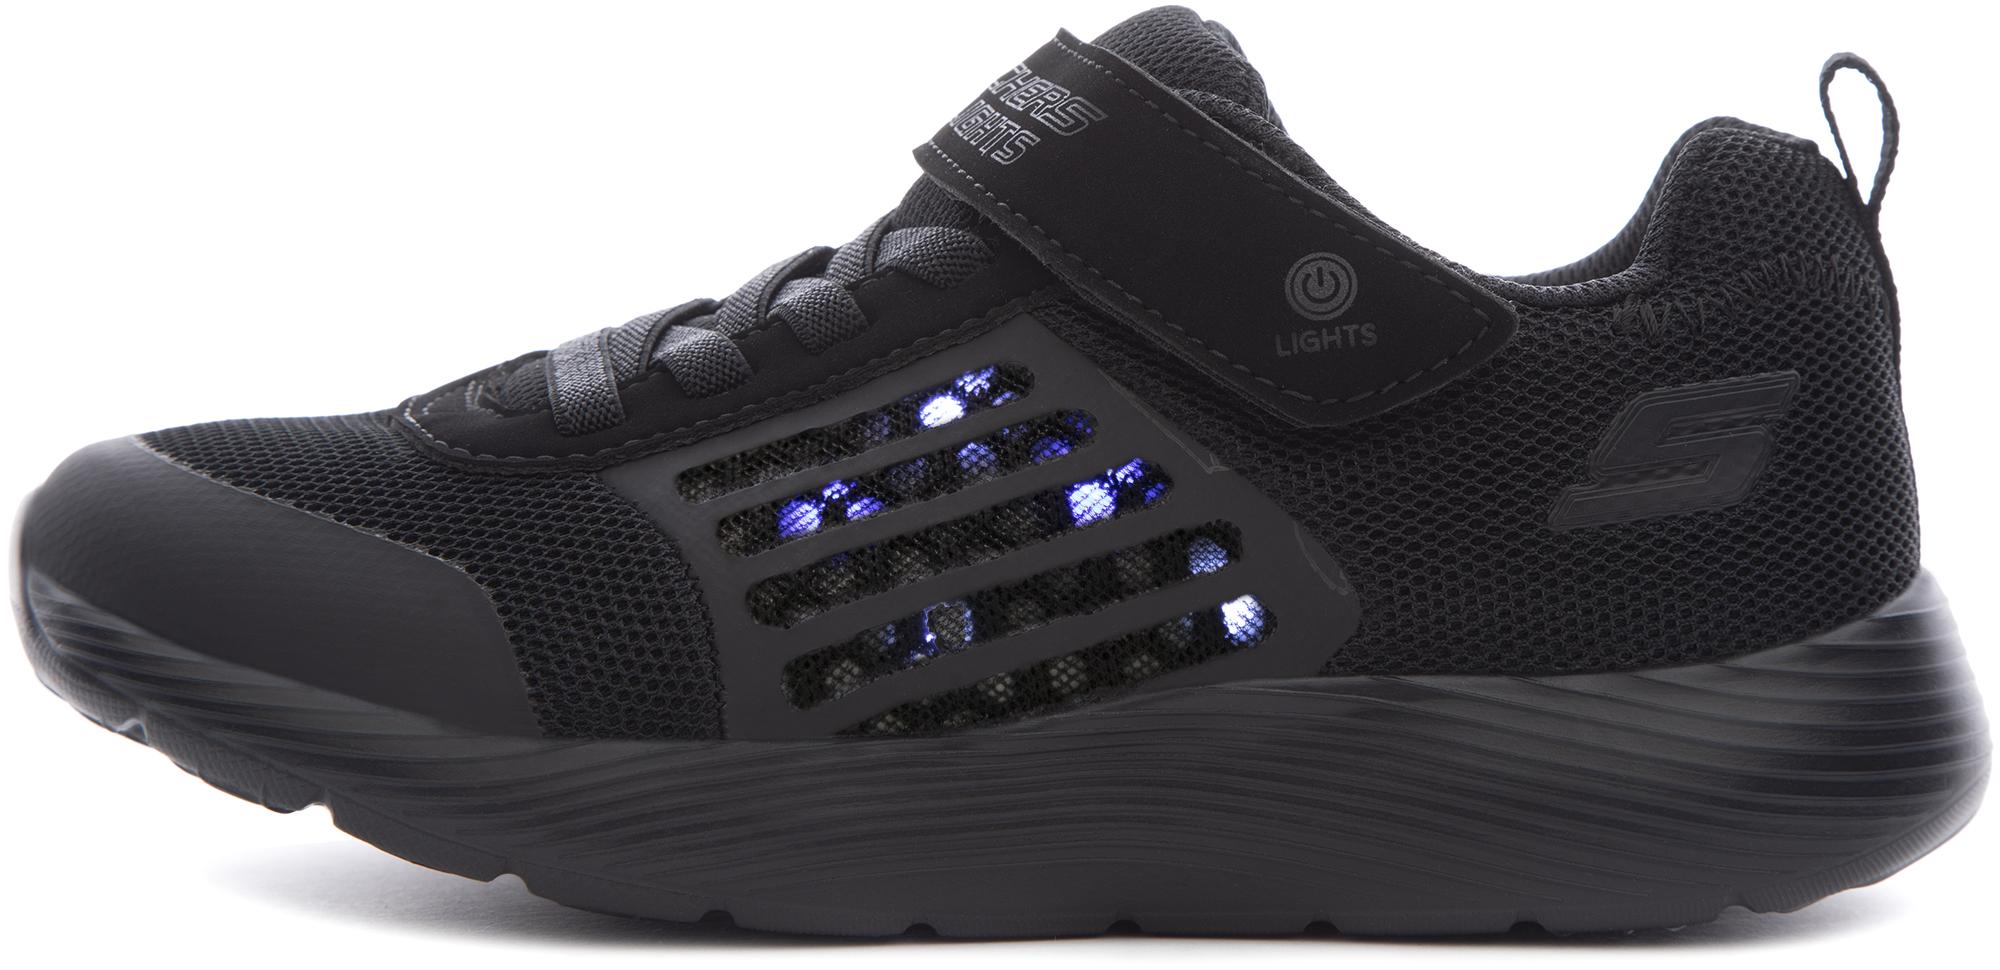 Skechers Полуботинки для мальчиков Dyna-Lights, размер 36